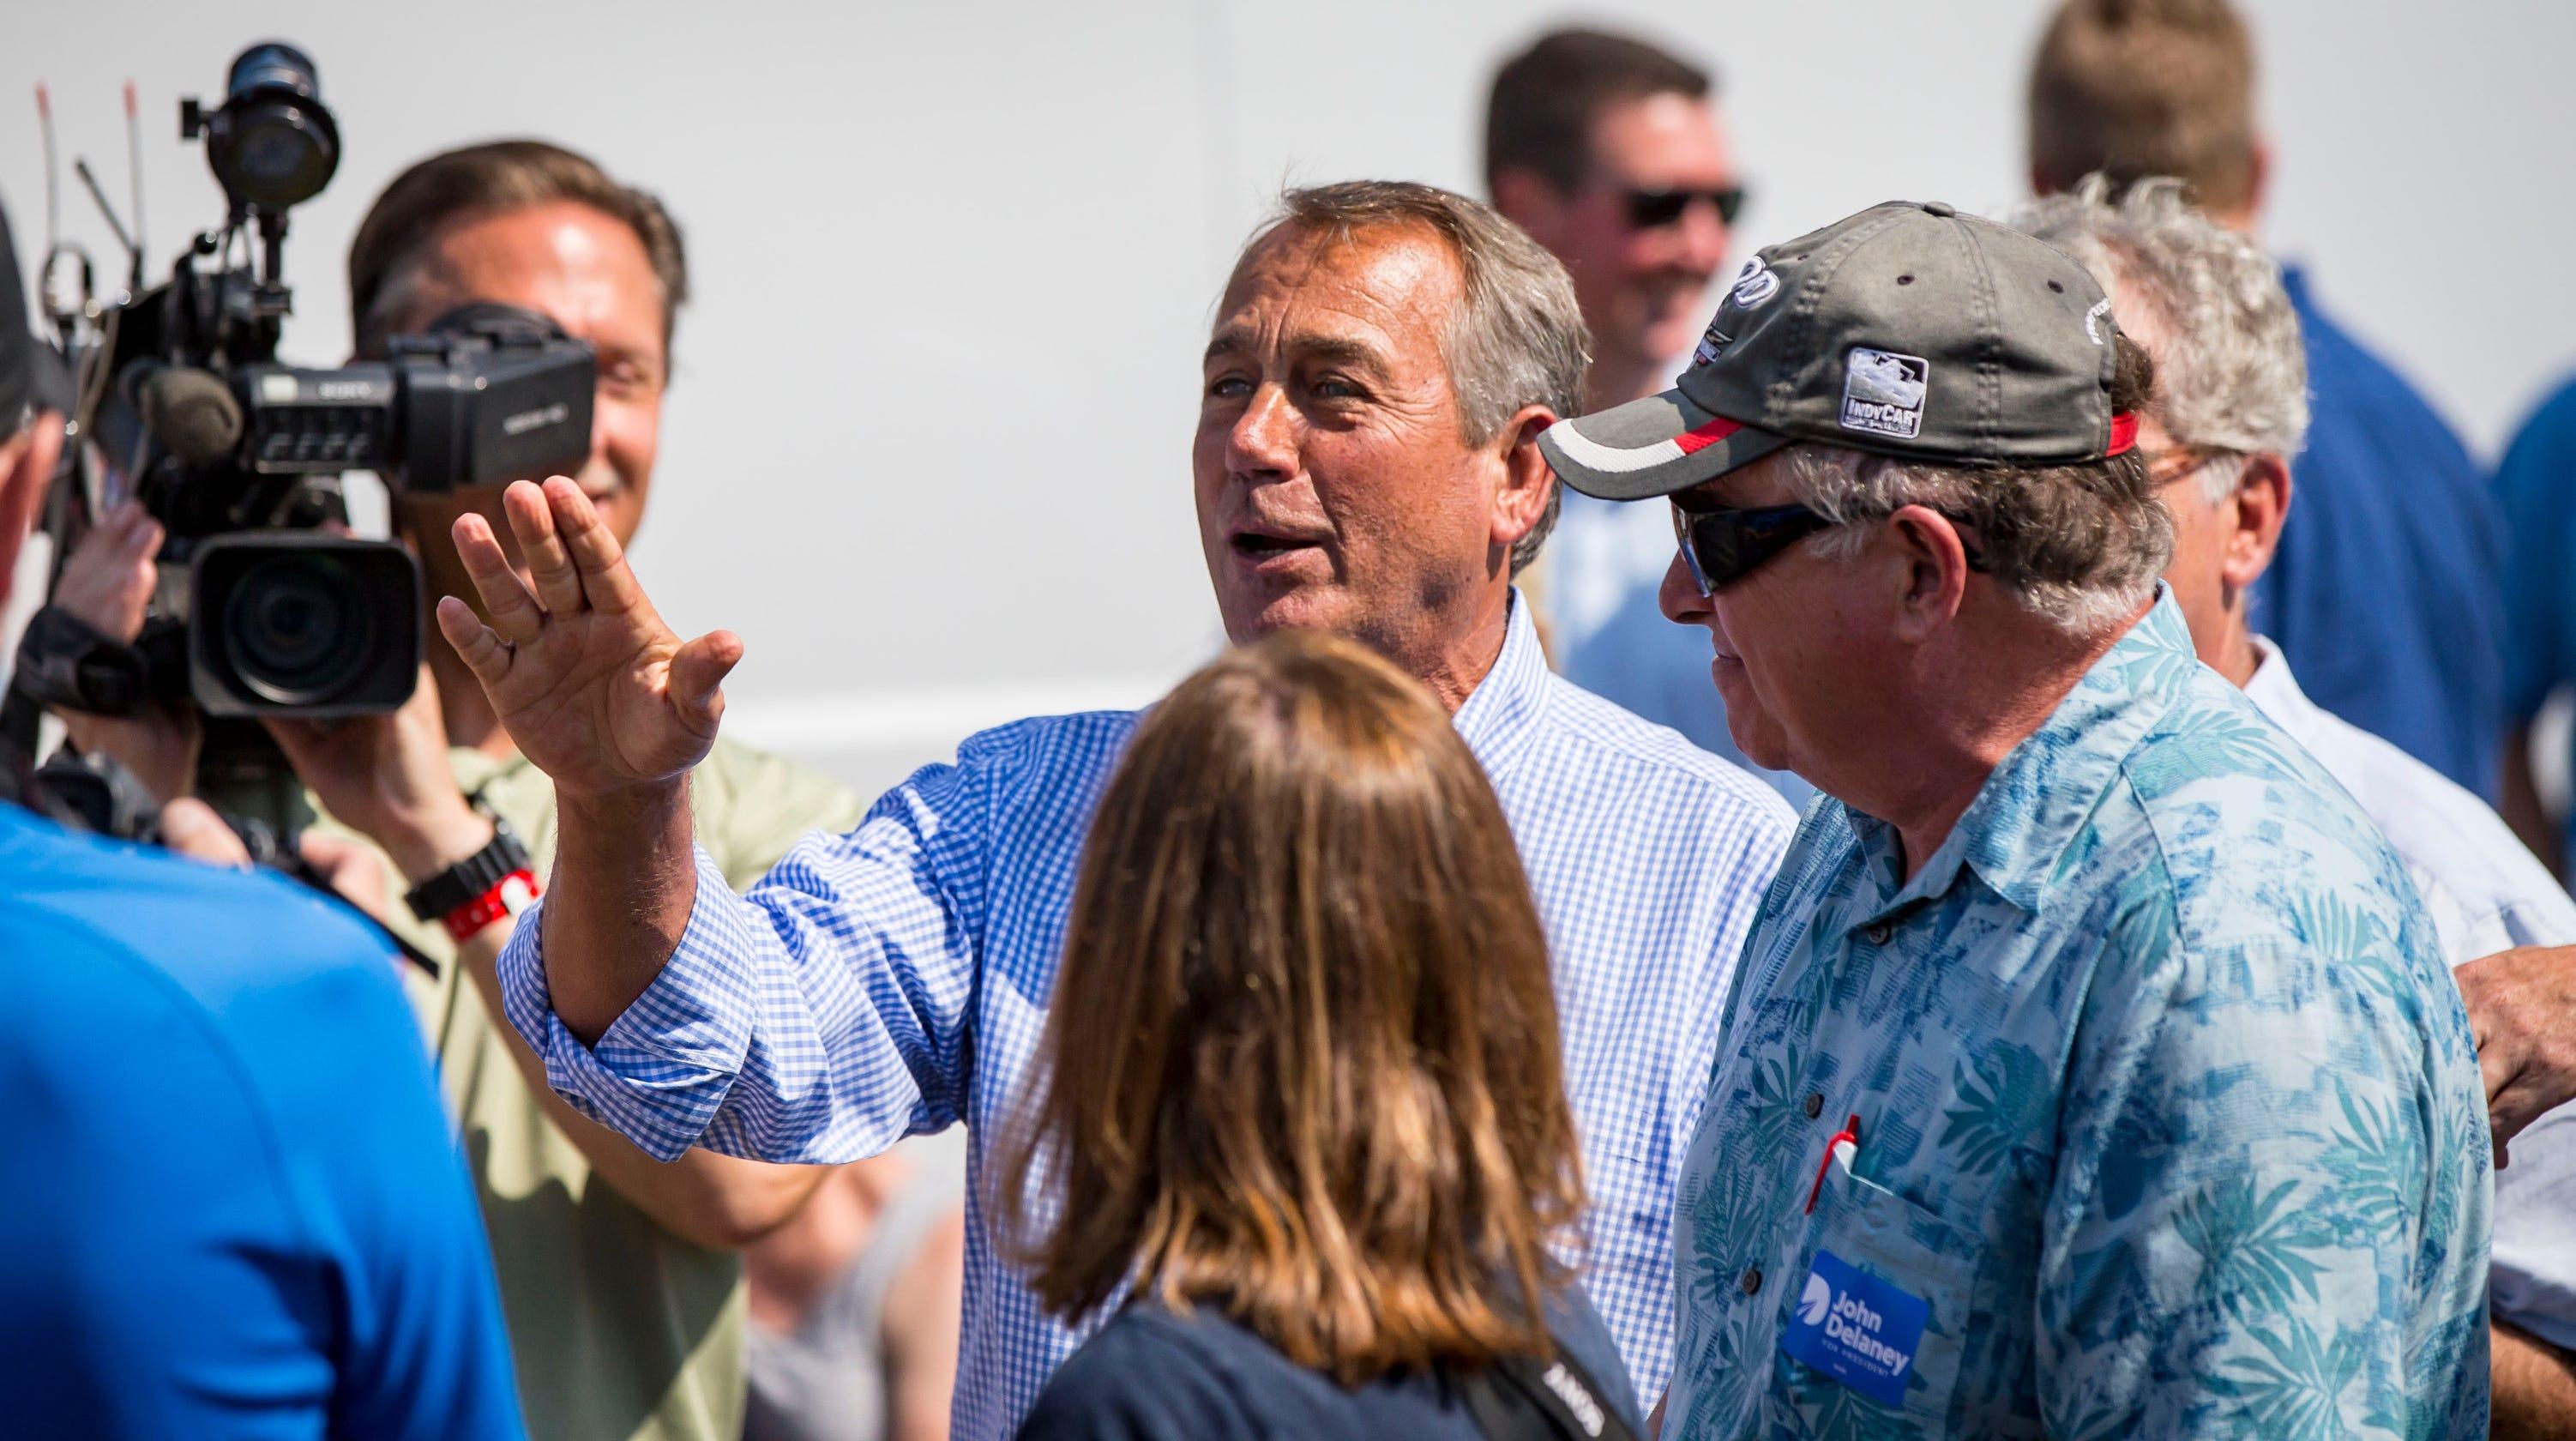 Political highlights of 2018 Iowa State Fair: 2020 intrigue